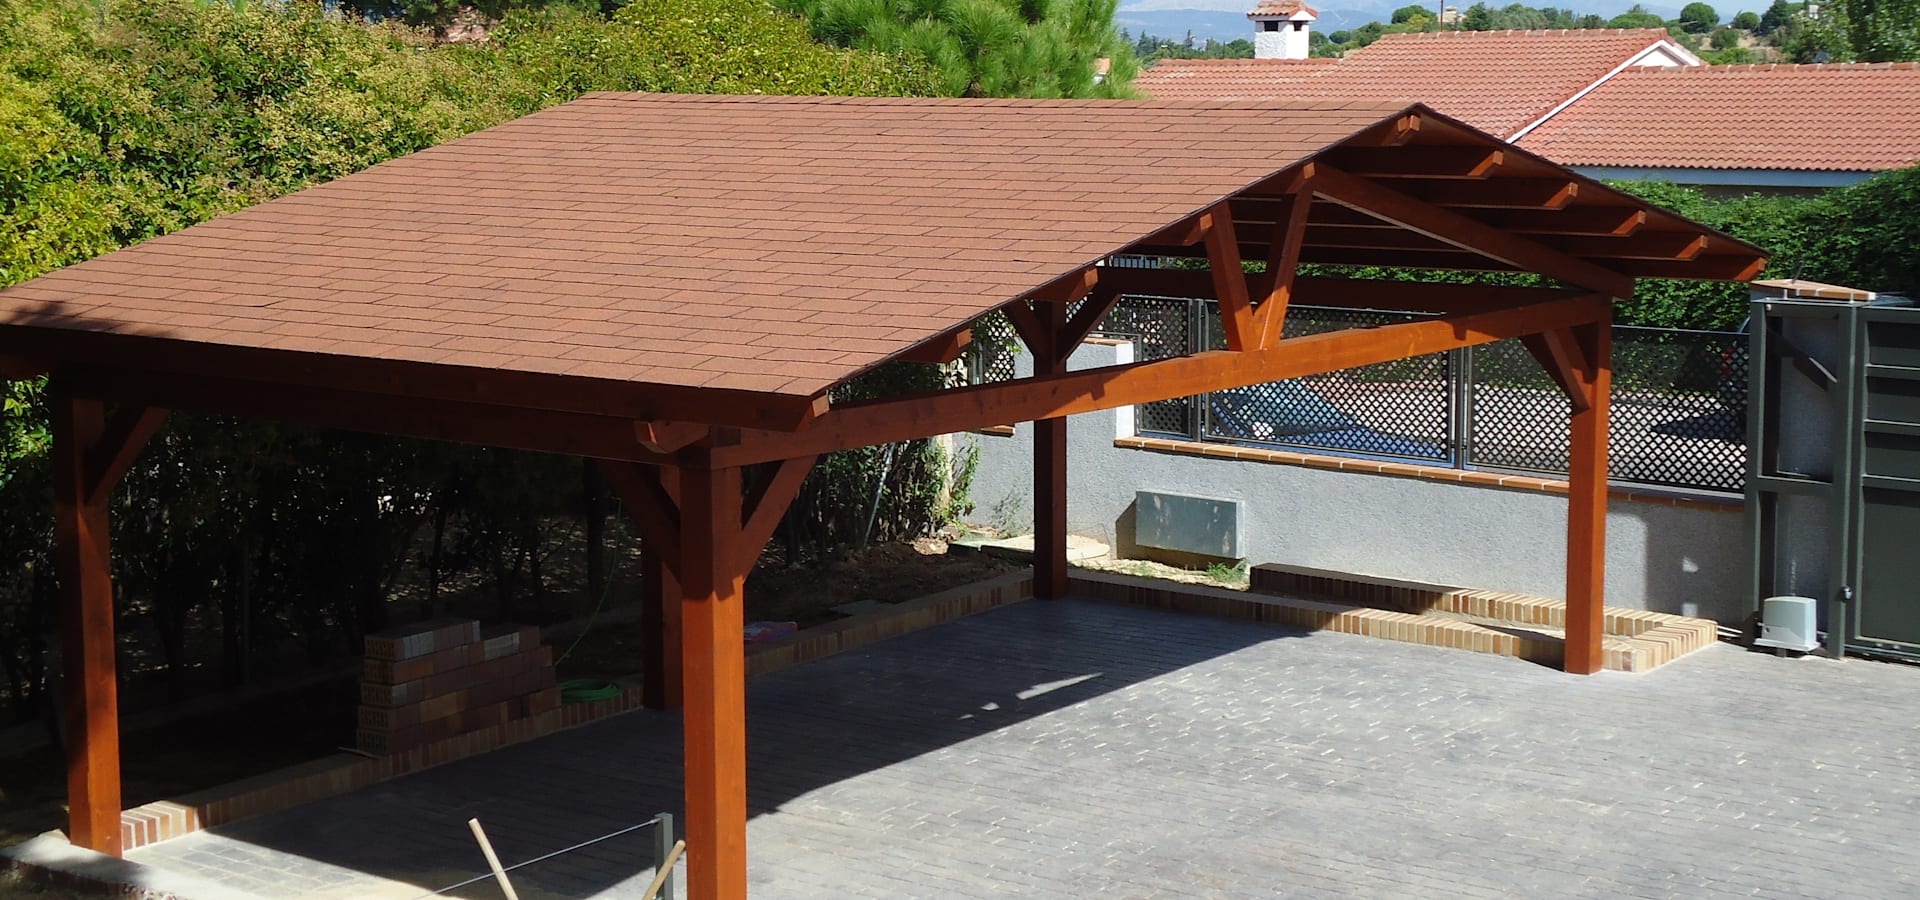 Garajes de madera by pergomadera p rgolas y porches de - Pergolas de madera ...